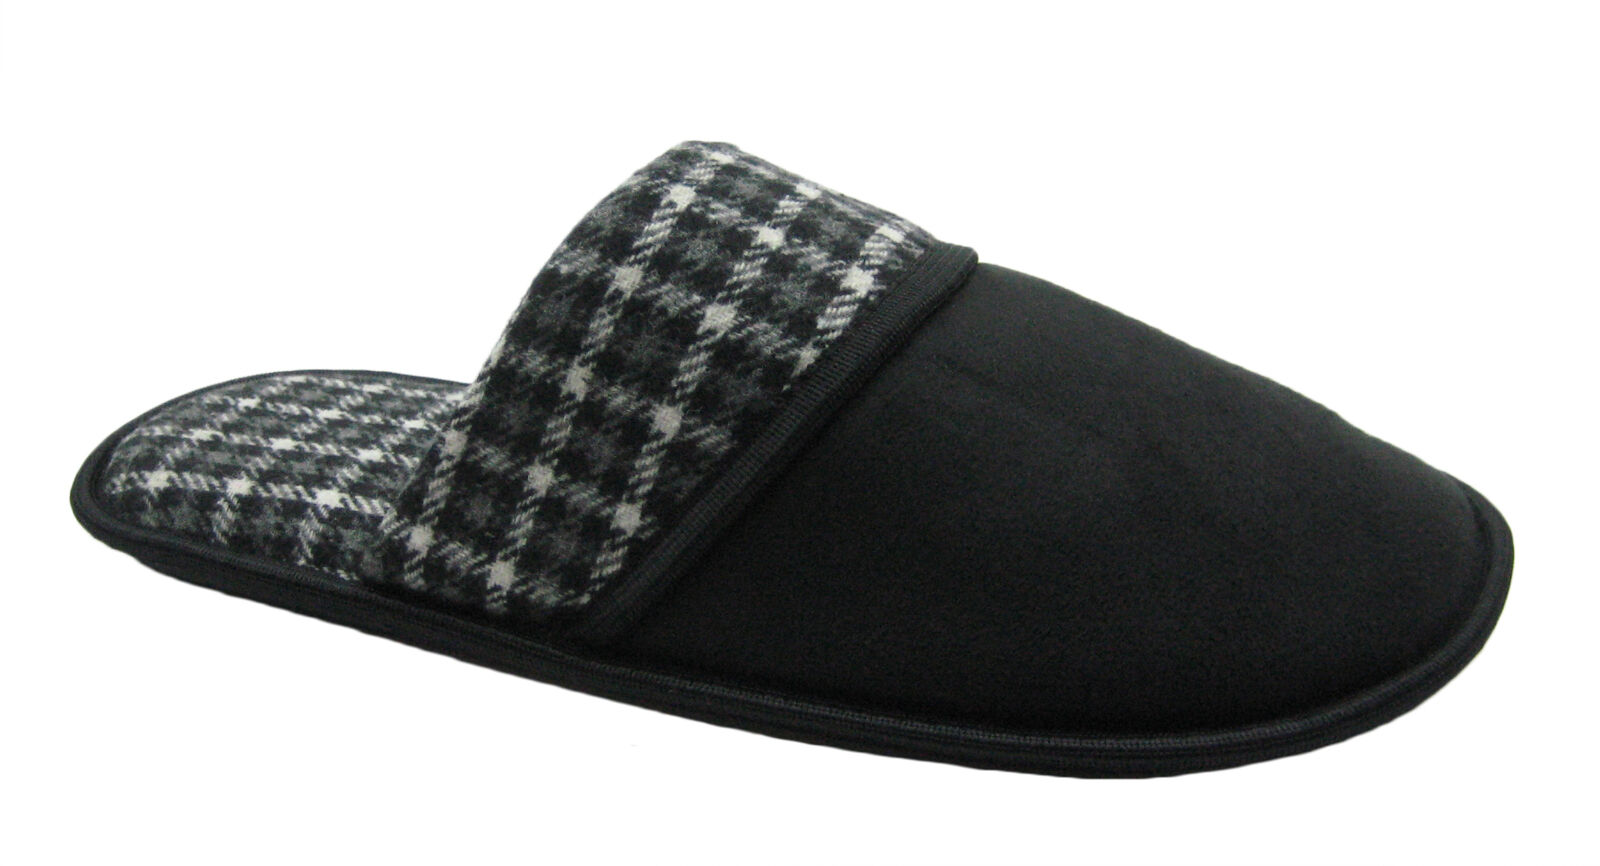 Micro-suede or Plaid Upper Men's Scuff House Slipper